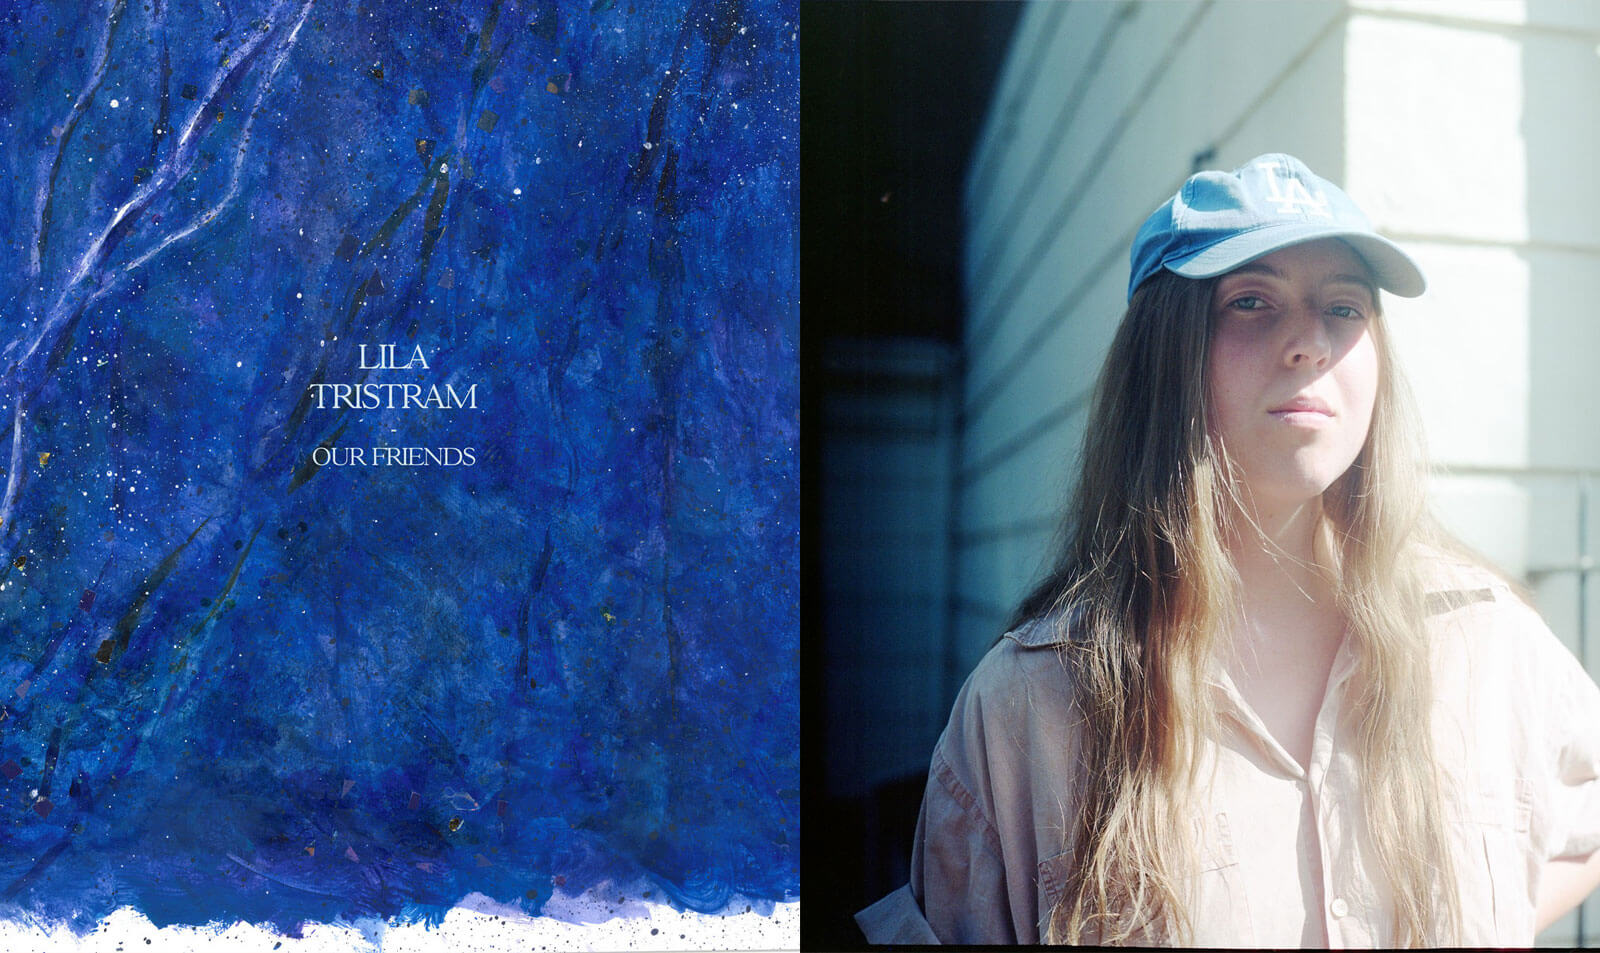 Music|Lila Tristram